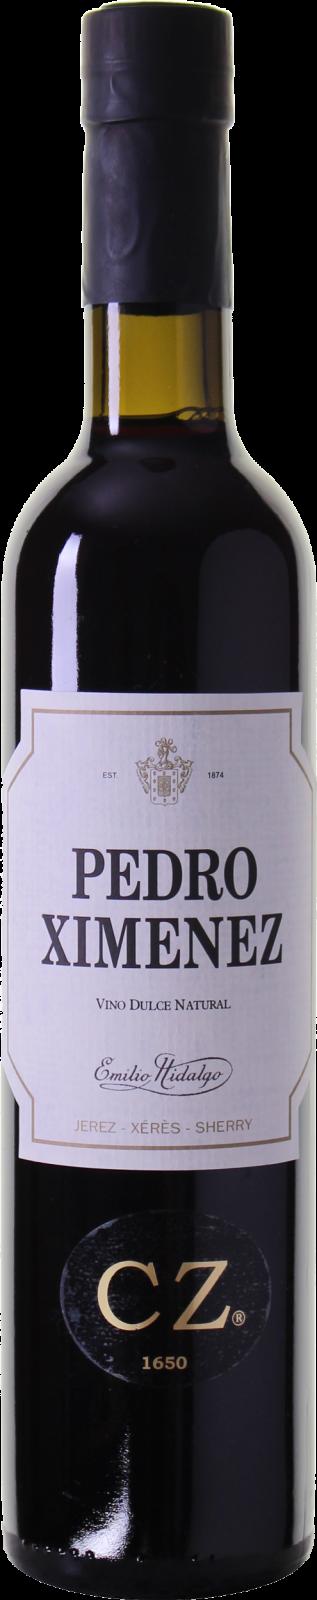 Emilio Hidalgo PX Sherry